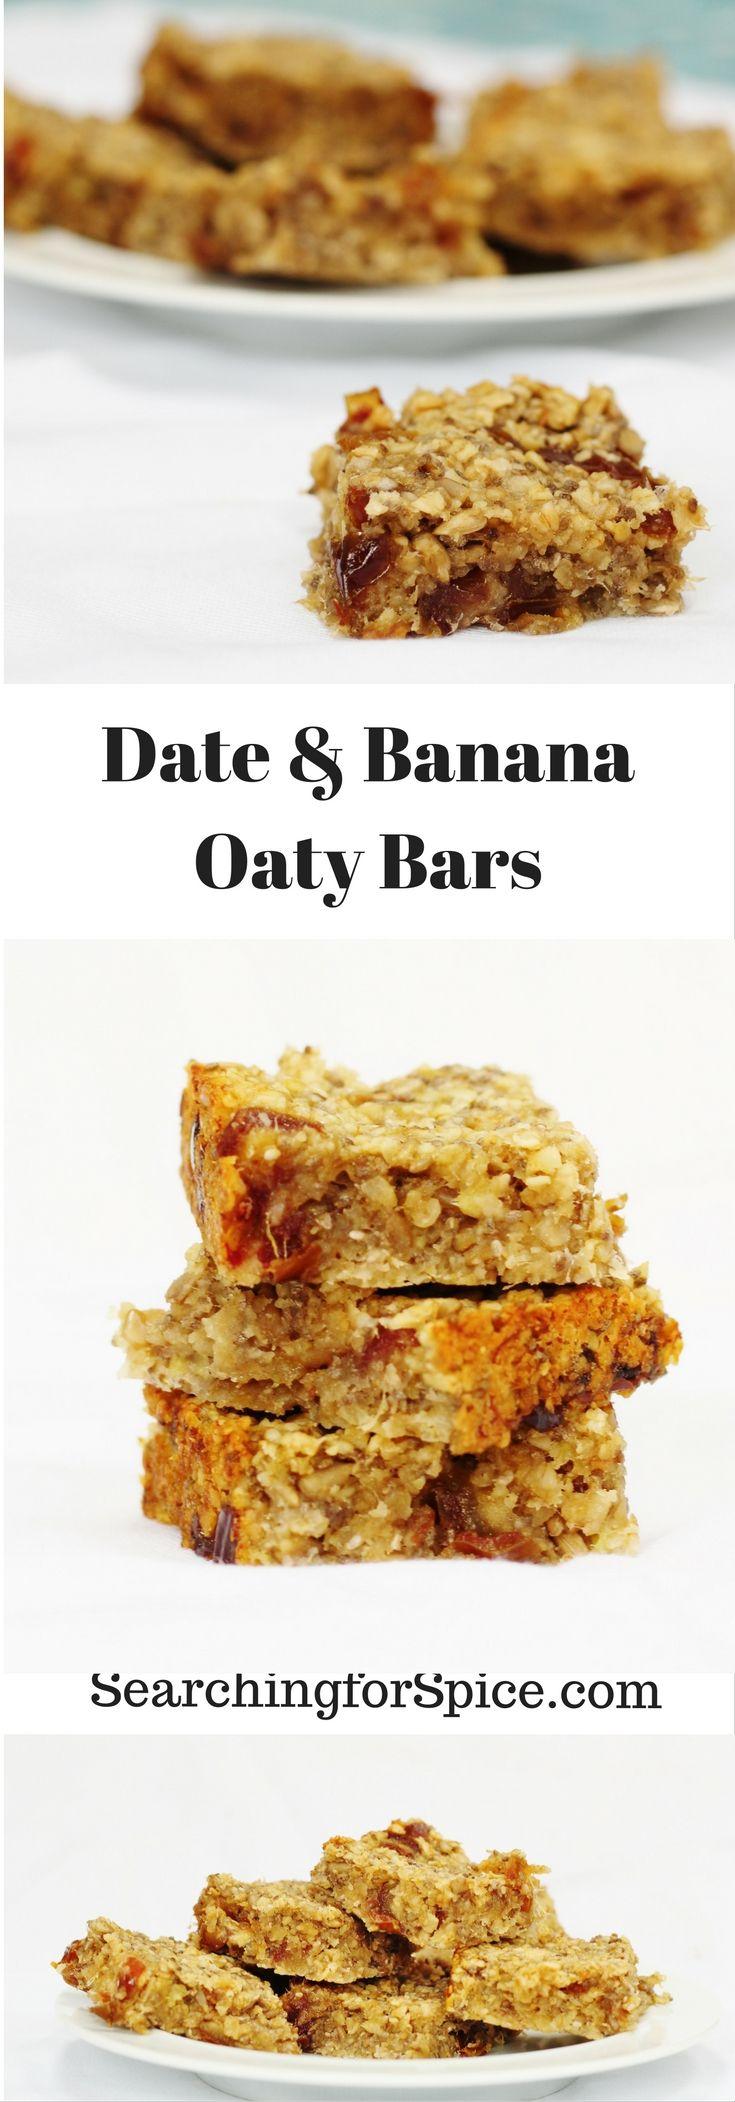 Date and Banana Oaty Bars